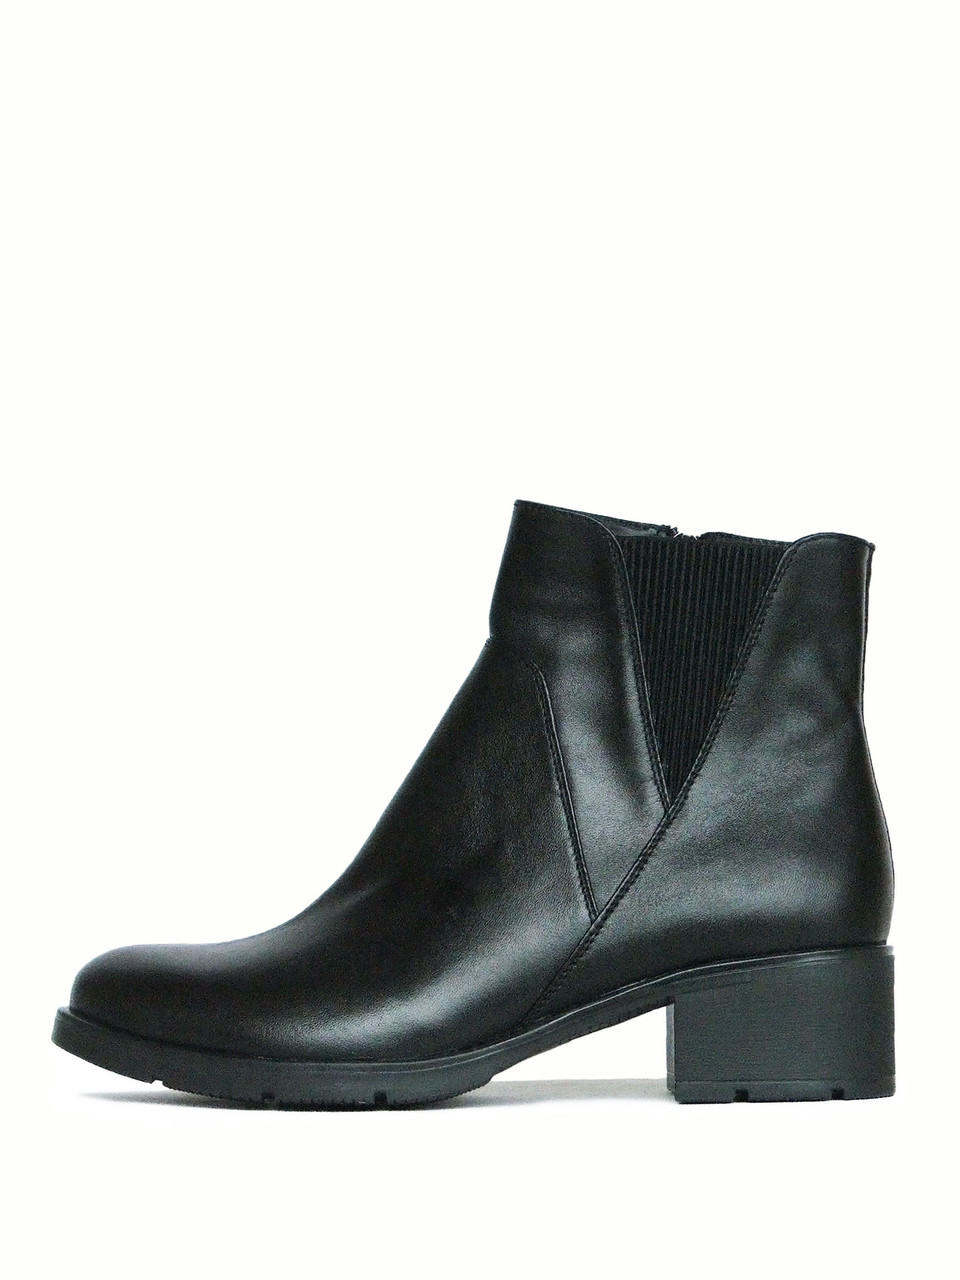 Ботинки женские челси на каблуке